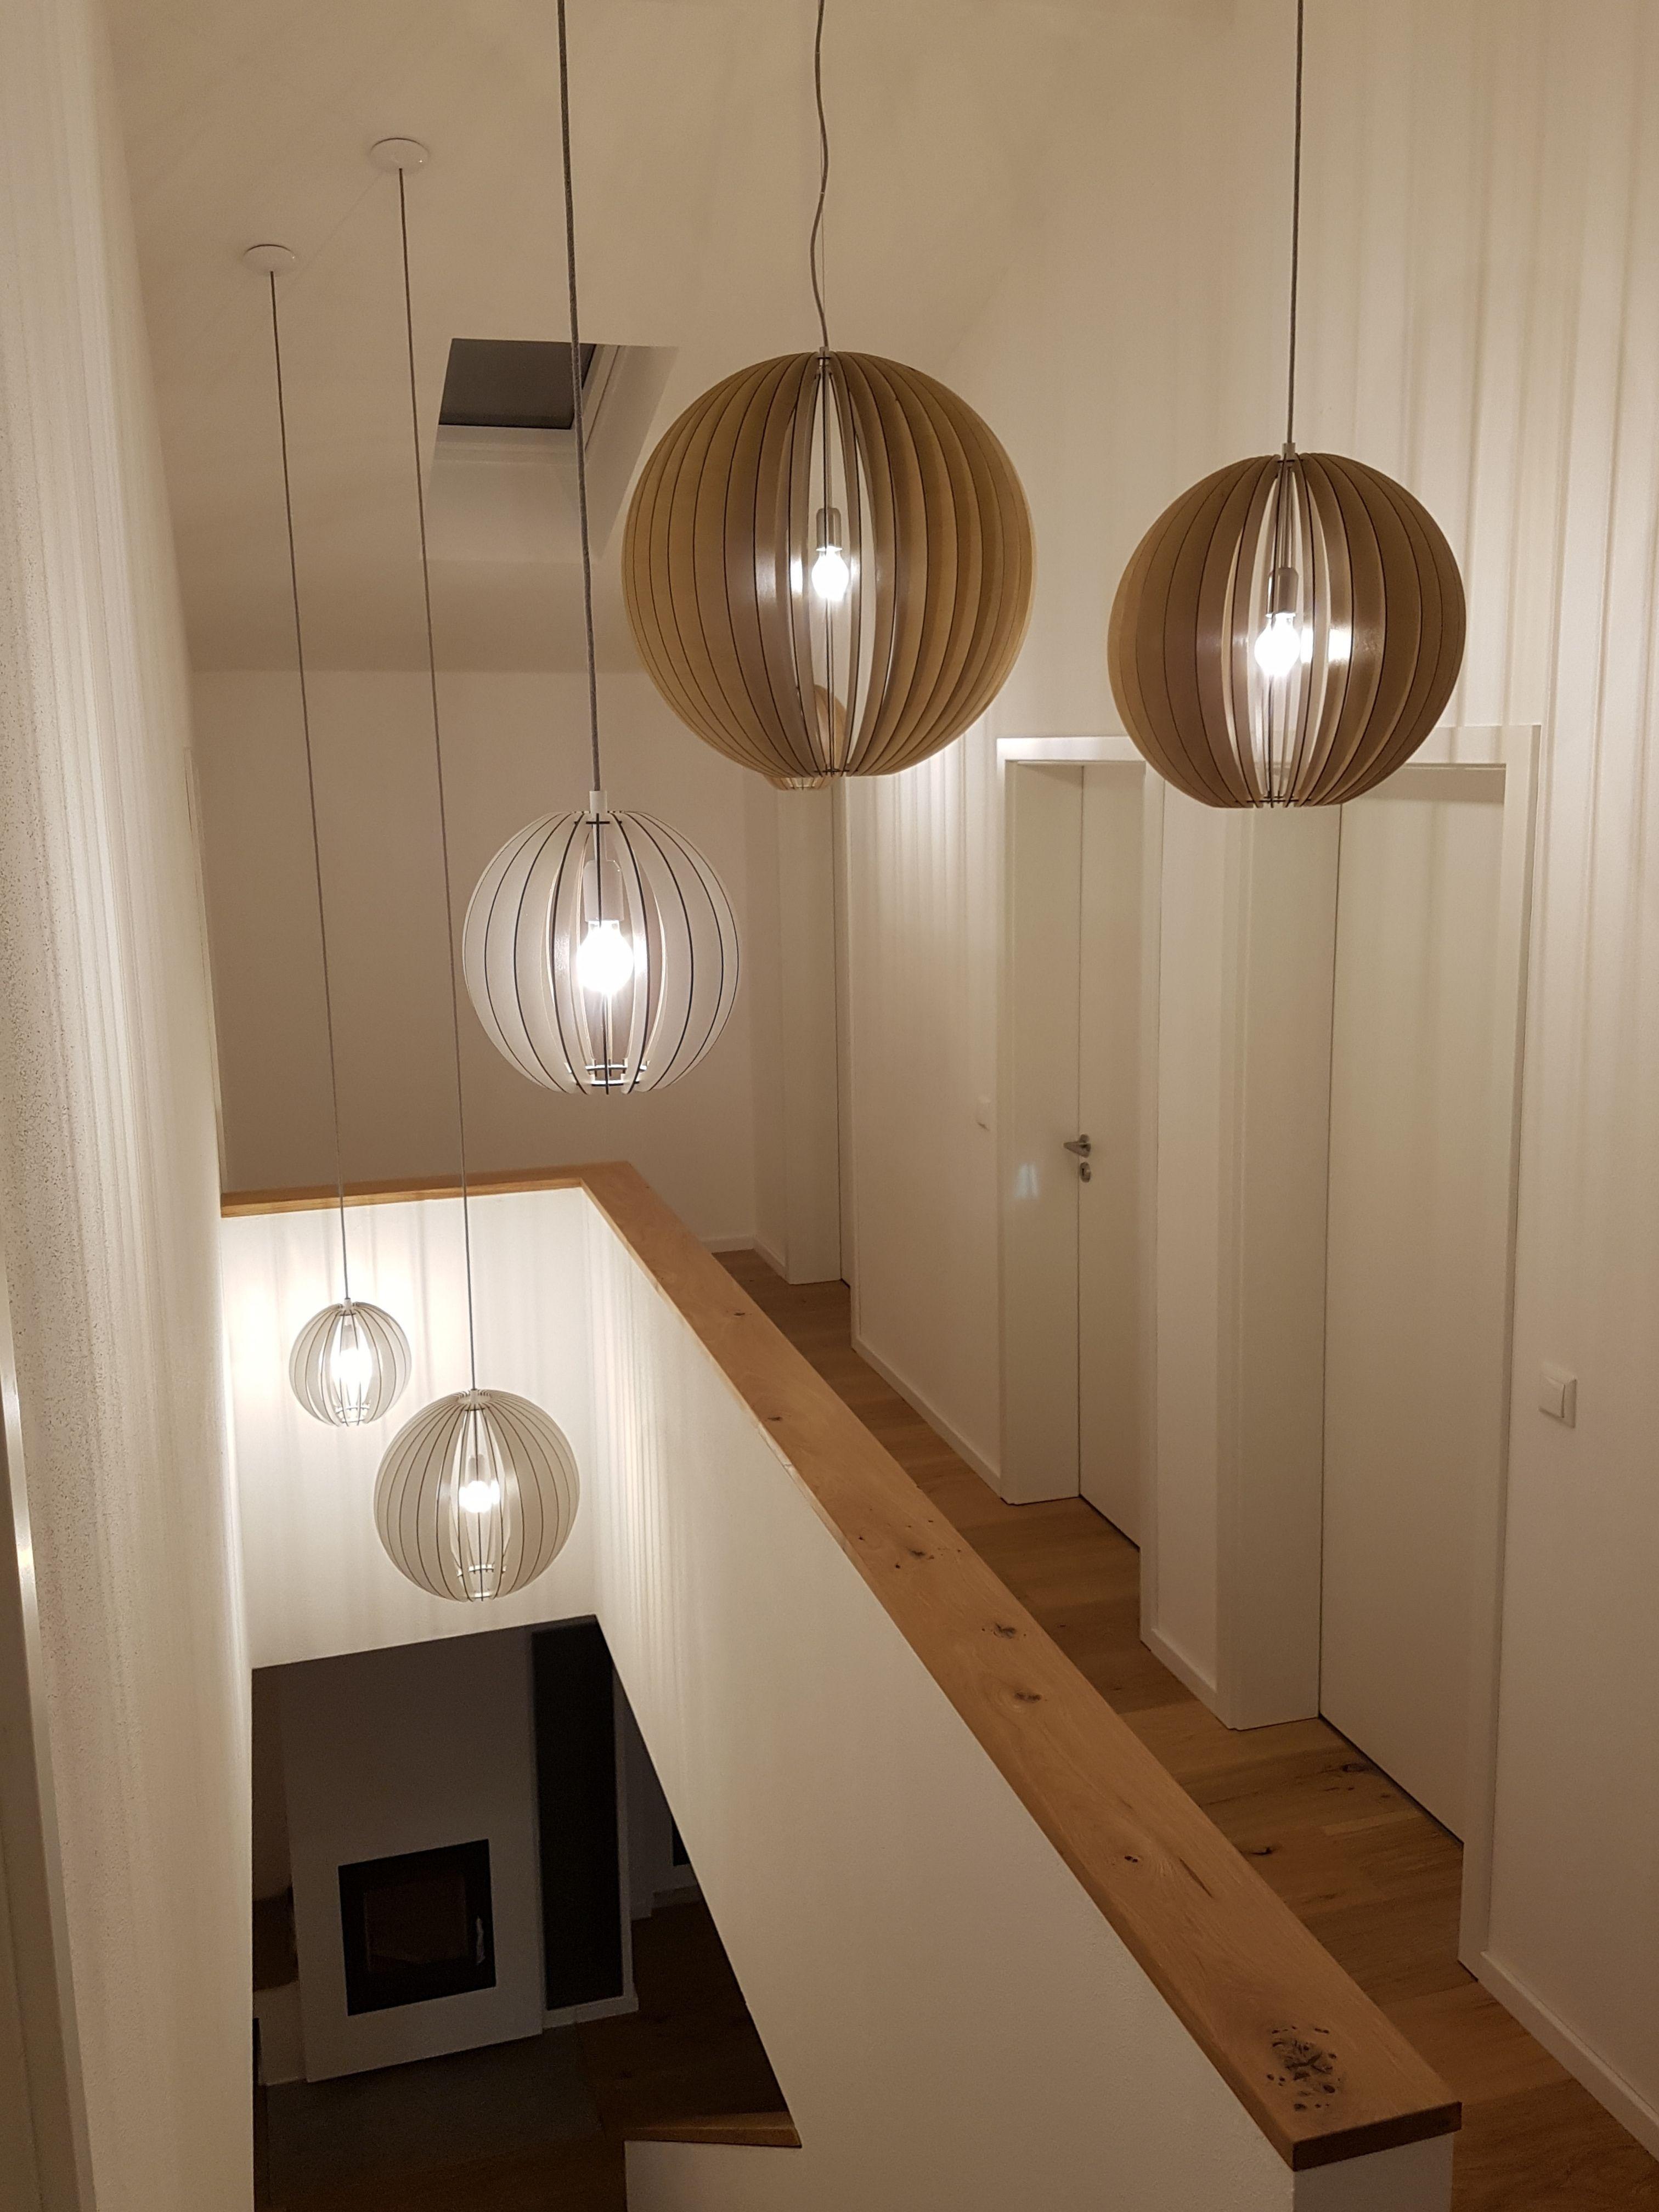 Treppenhausbeleuchtung In Holz Treppenhaus Beleuchtung Treppe Haus Lampen Treppenhaus